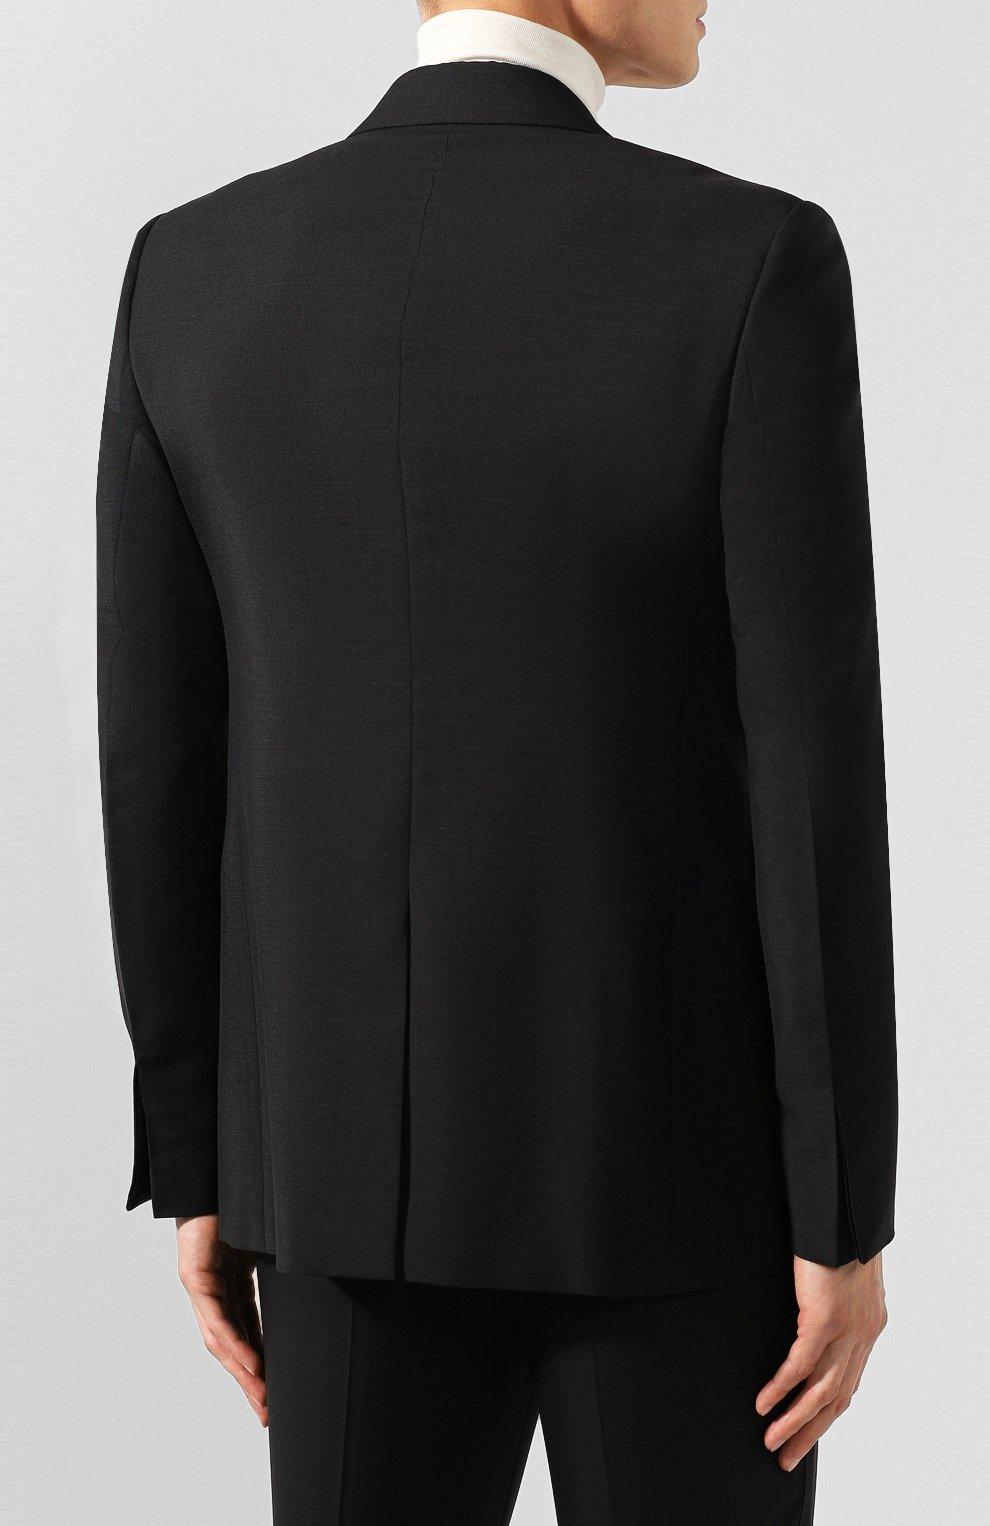 Мужской пиджак BOTTEGA VENETA черного цвета, арт. 576811/V0KI1 | Фото 4